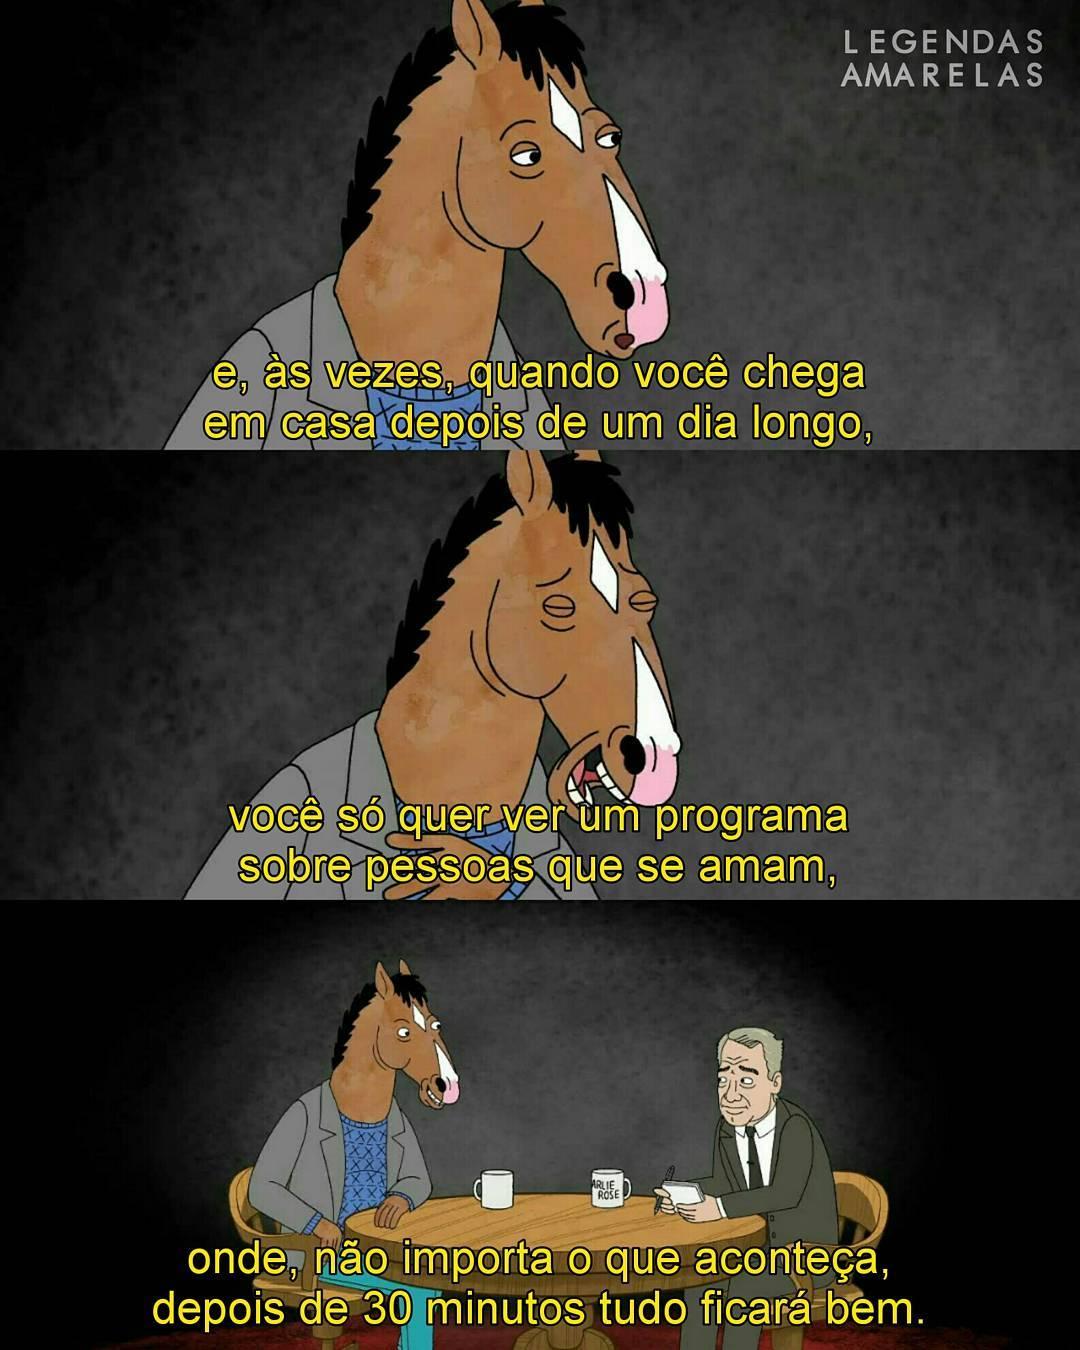 Bojack Horseman 19 Frases Para Refletir Legendas Amarelas